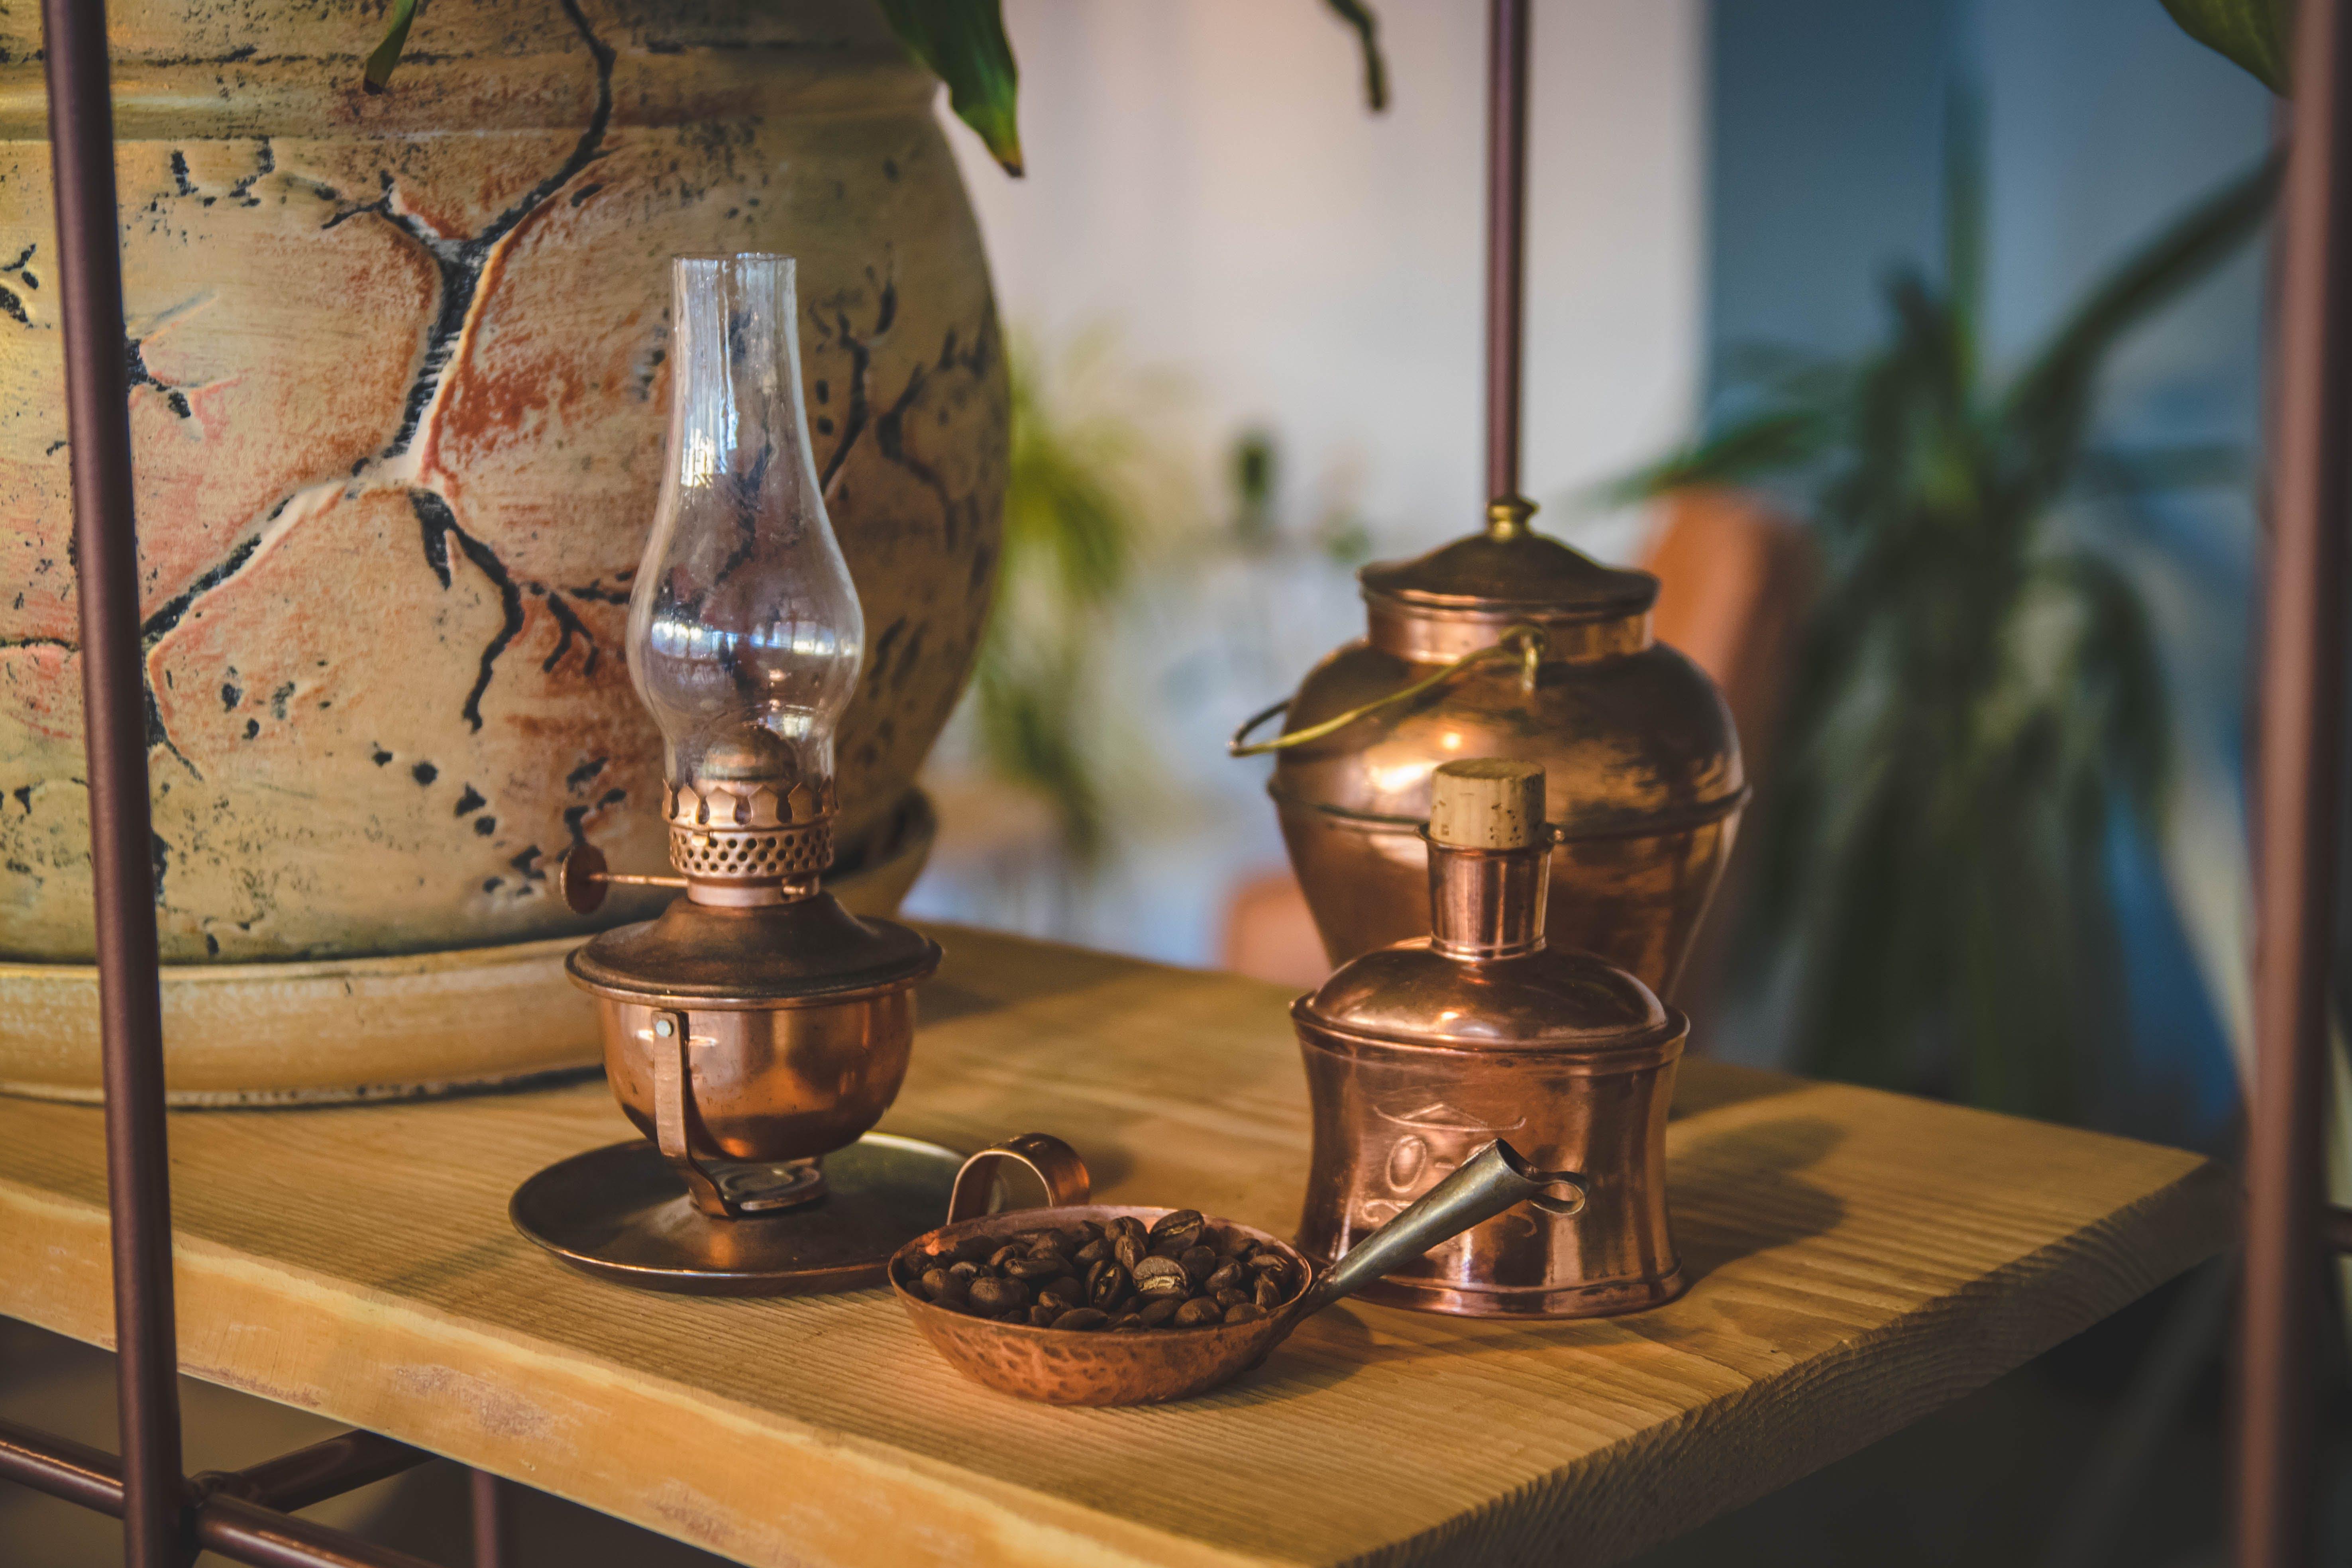 Brass-colored Oil Lamp